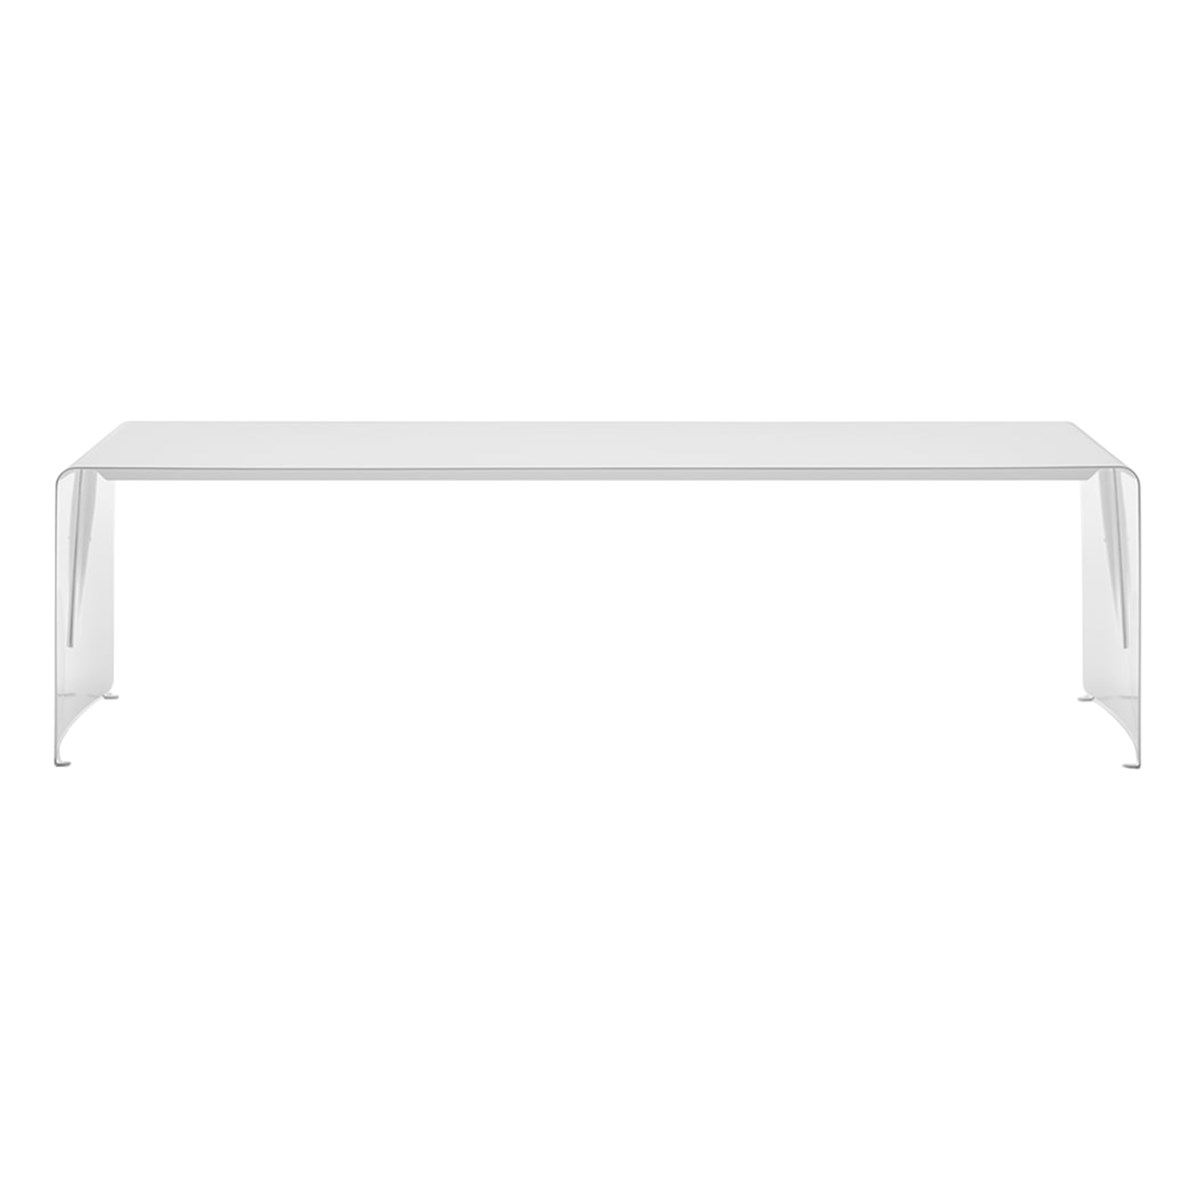 MDF-Italia-Xavier-Lust-La-Grande-Table-Matisse-1